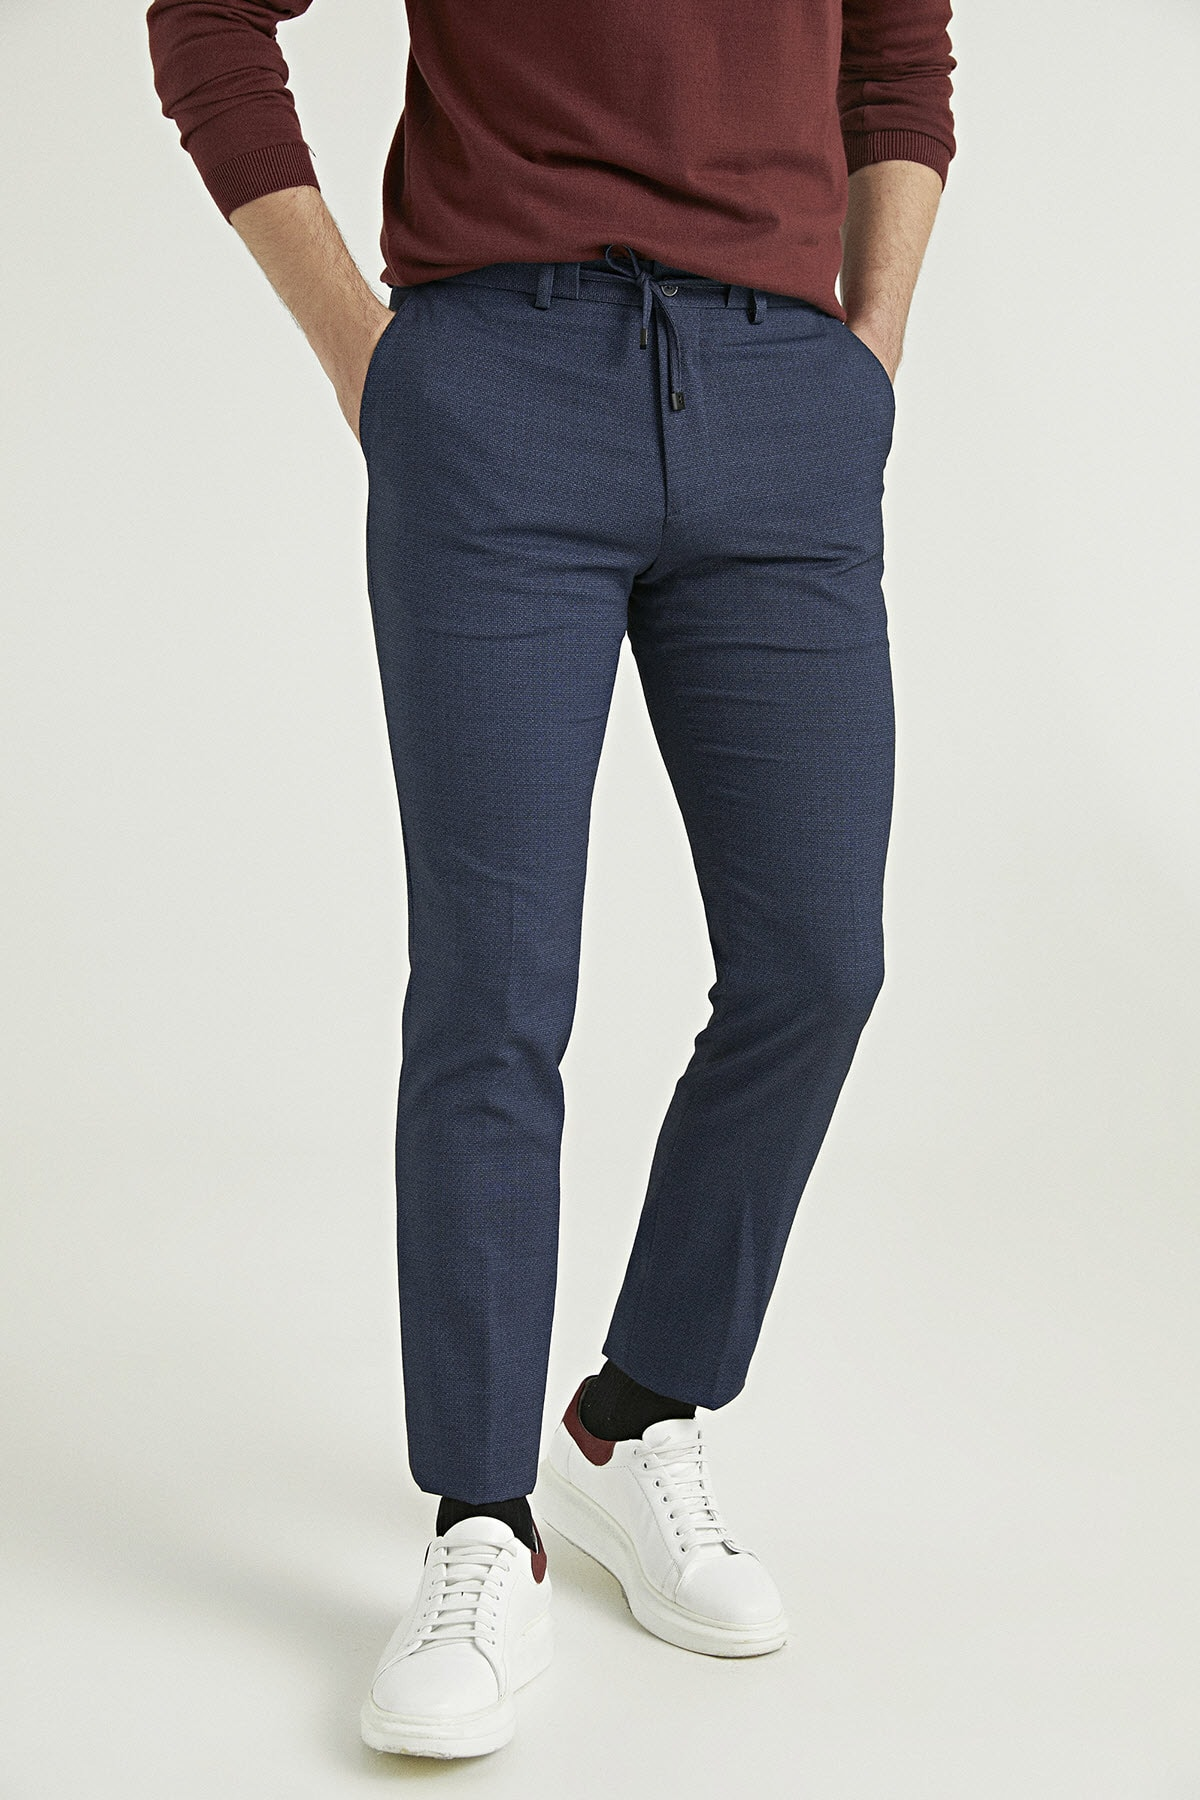 D'S Damat Sihirli Pantolon Slim Fit 2